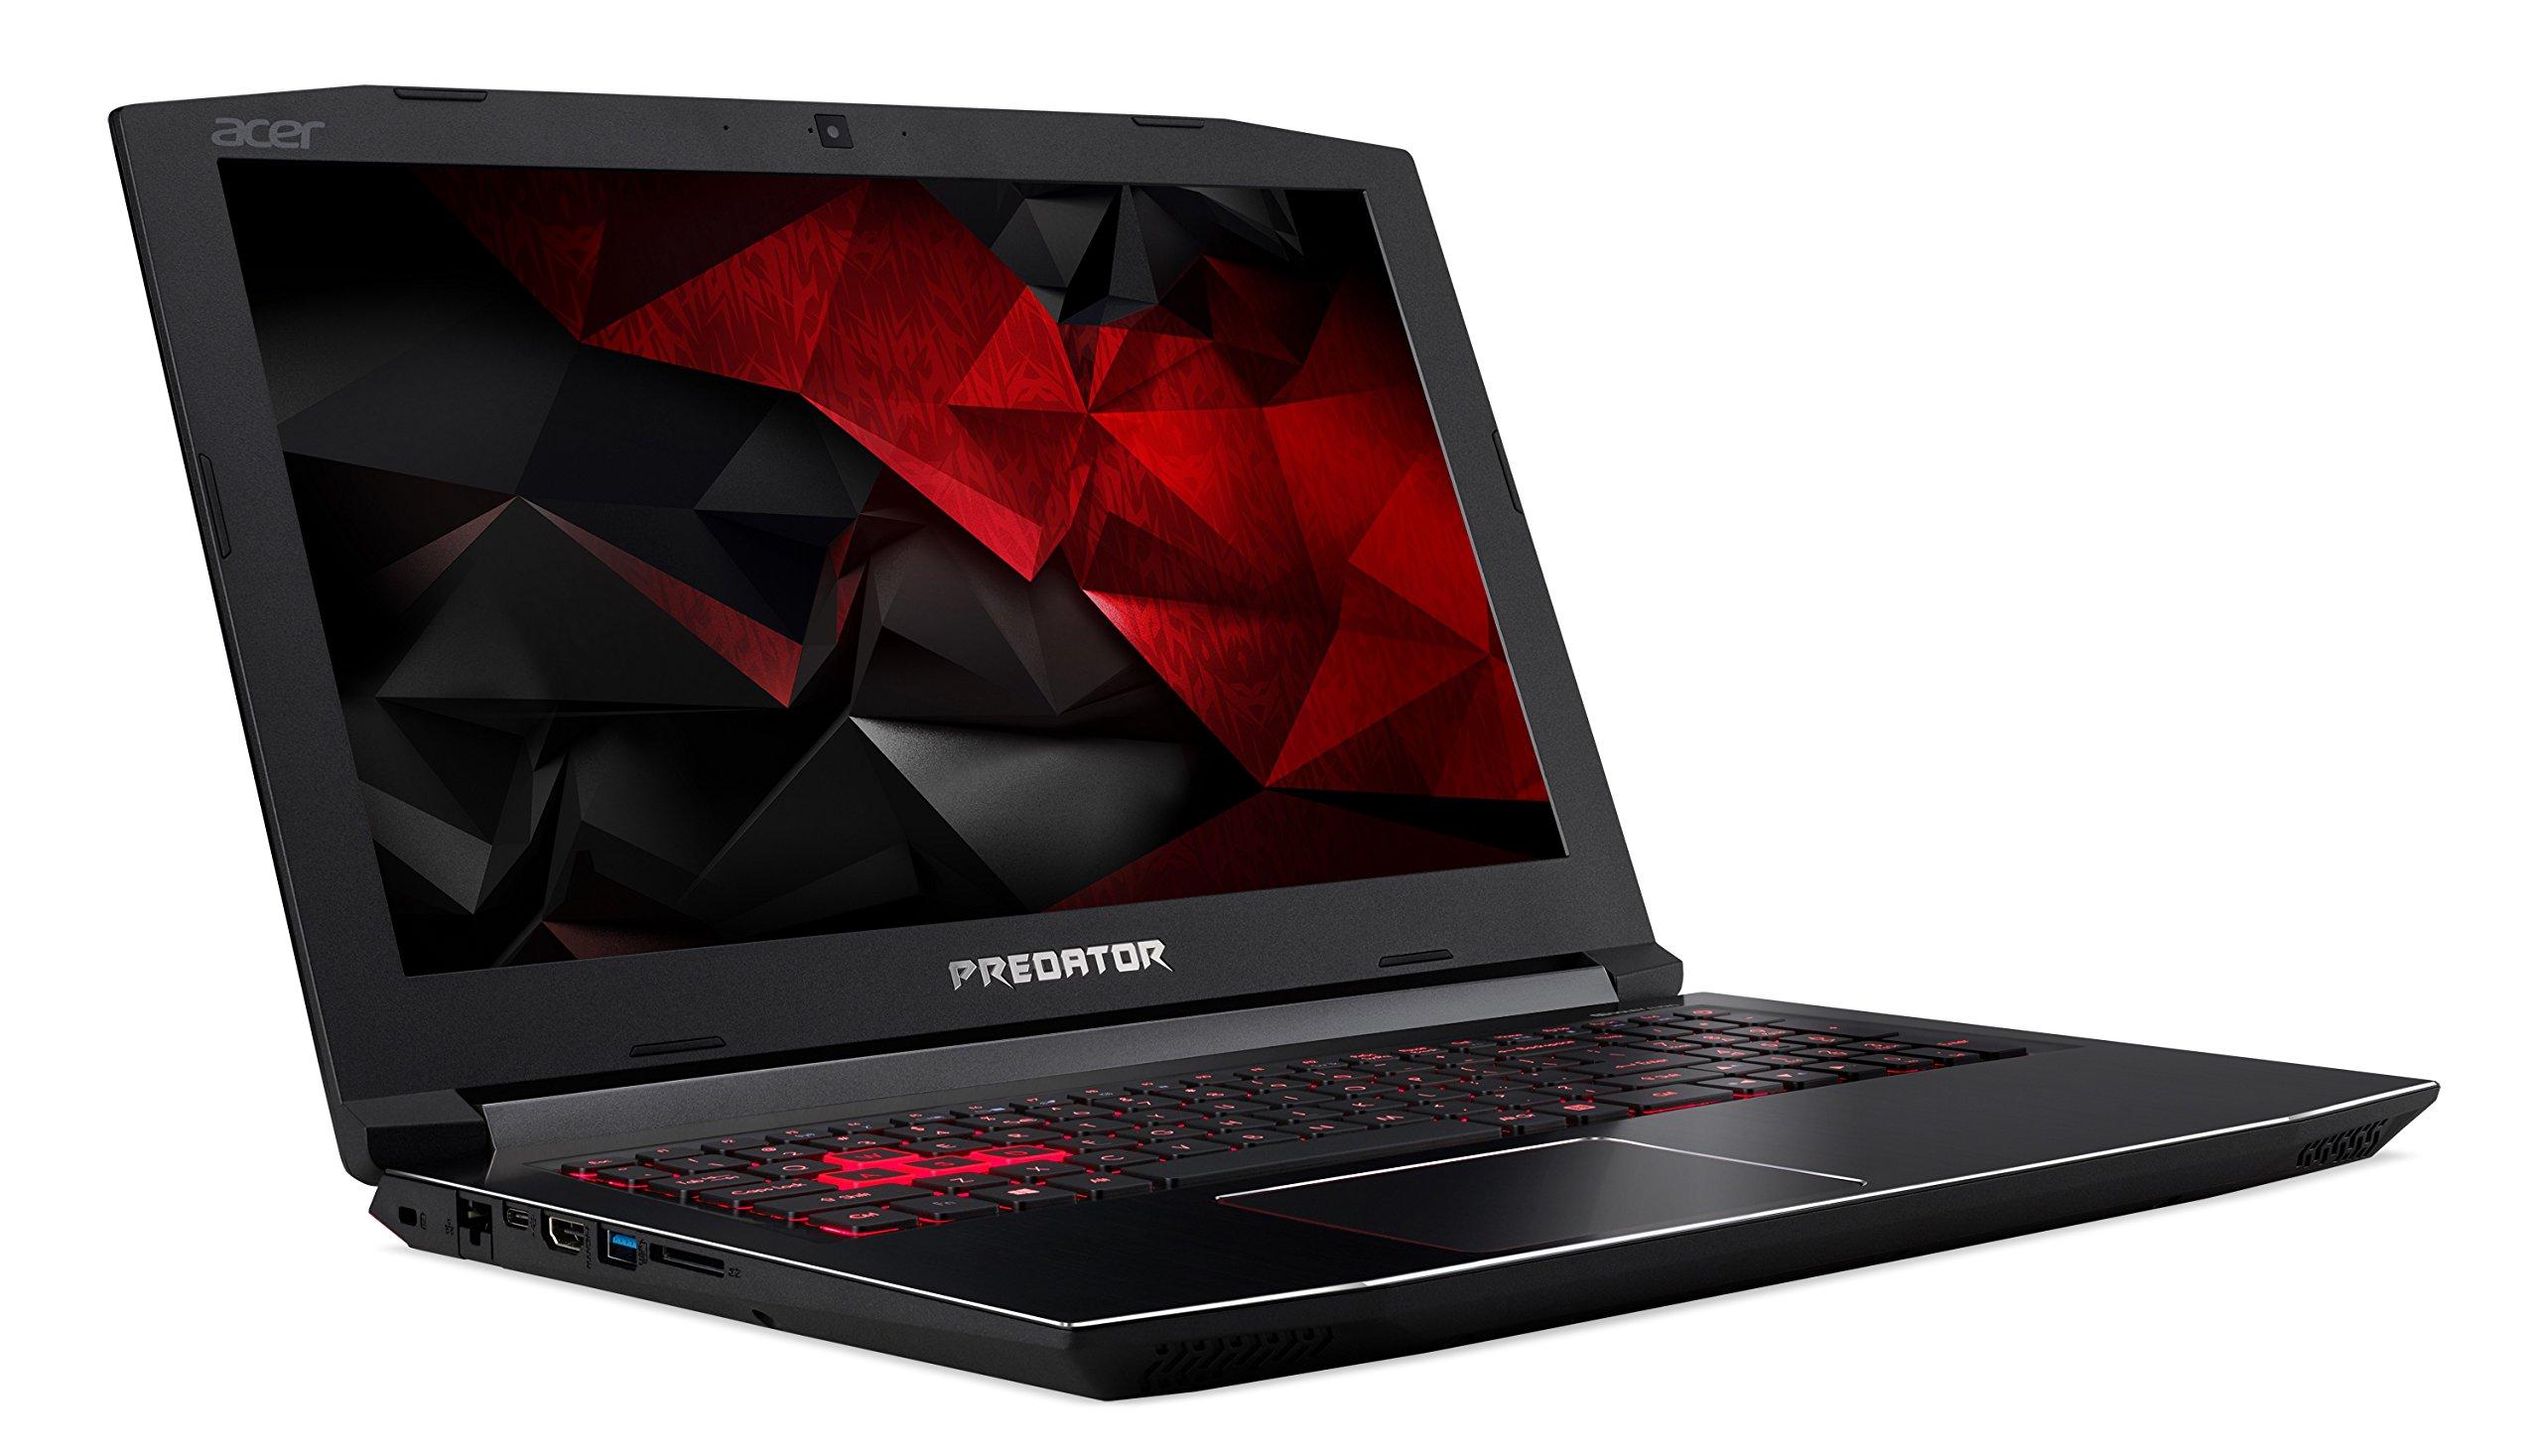 "Acer Predator Helios 300 Gaming Laptop, 15.6"" Full HD IPS, Intel i7 CPU, 16GB DDR4 RAM, 256GB SSD, GeForce GTX 1060-6GB, VR Ready, Red Backlit KB, Metal Chassis, Windows 10 64-bit, G3-571-77QK 3"